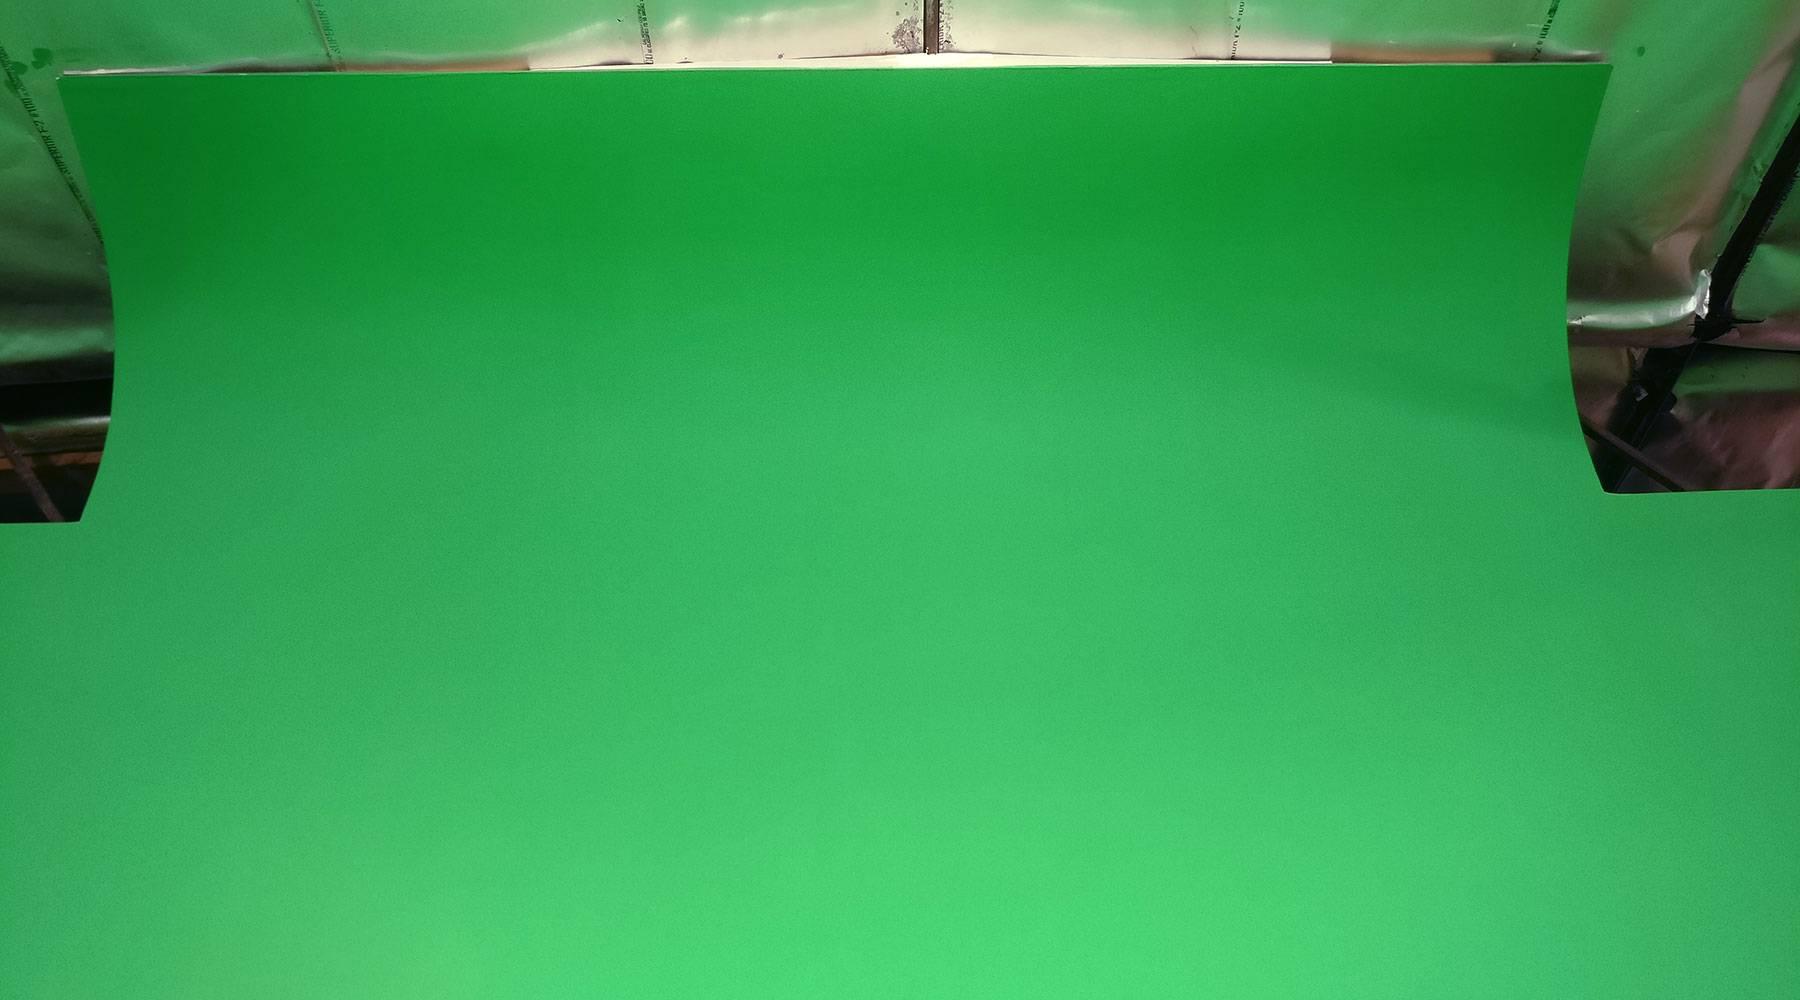 FULLY LIT GREEN SCREEN STUDIO / LOS ANGELES